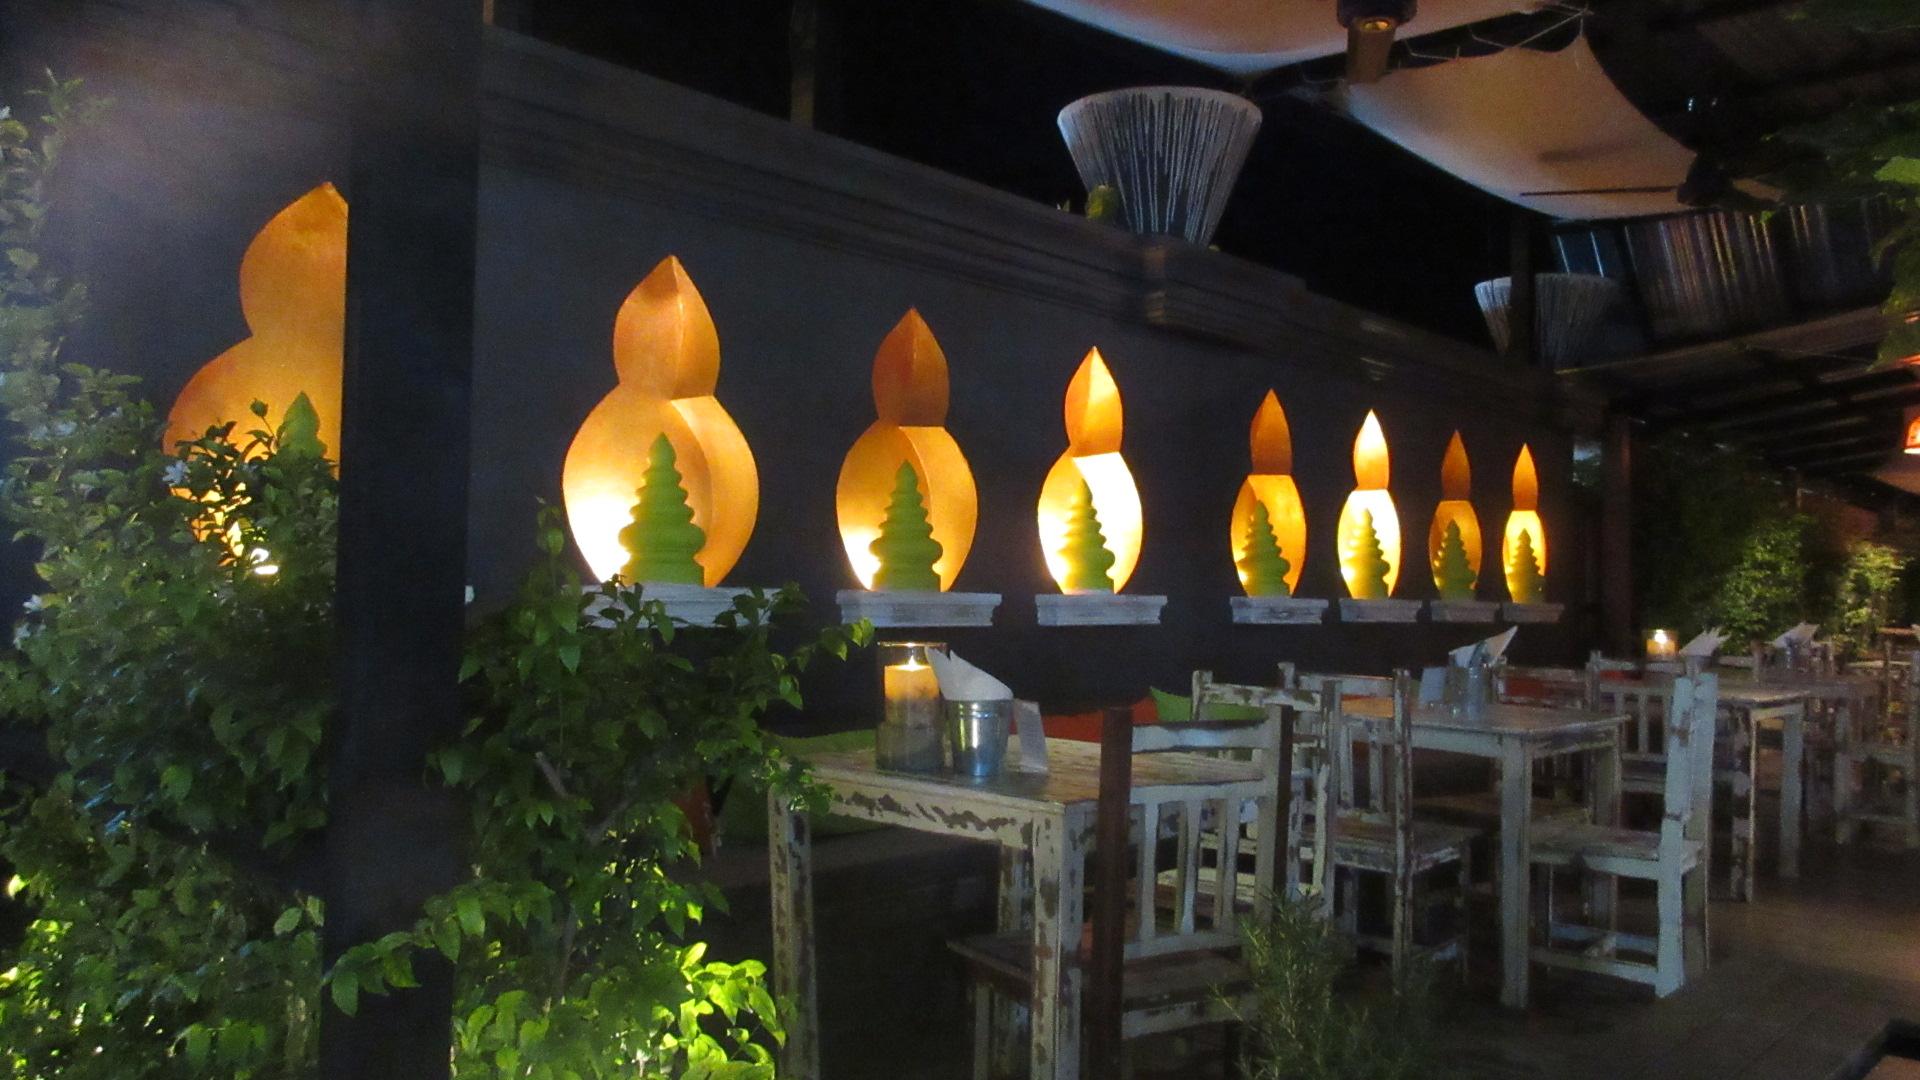 Koh samui island restaurants thailand the five star vagabond